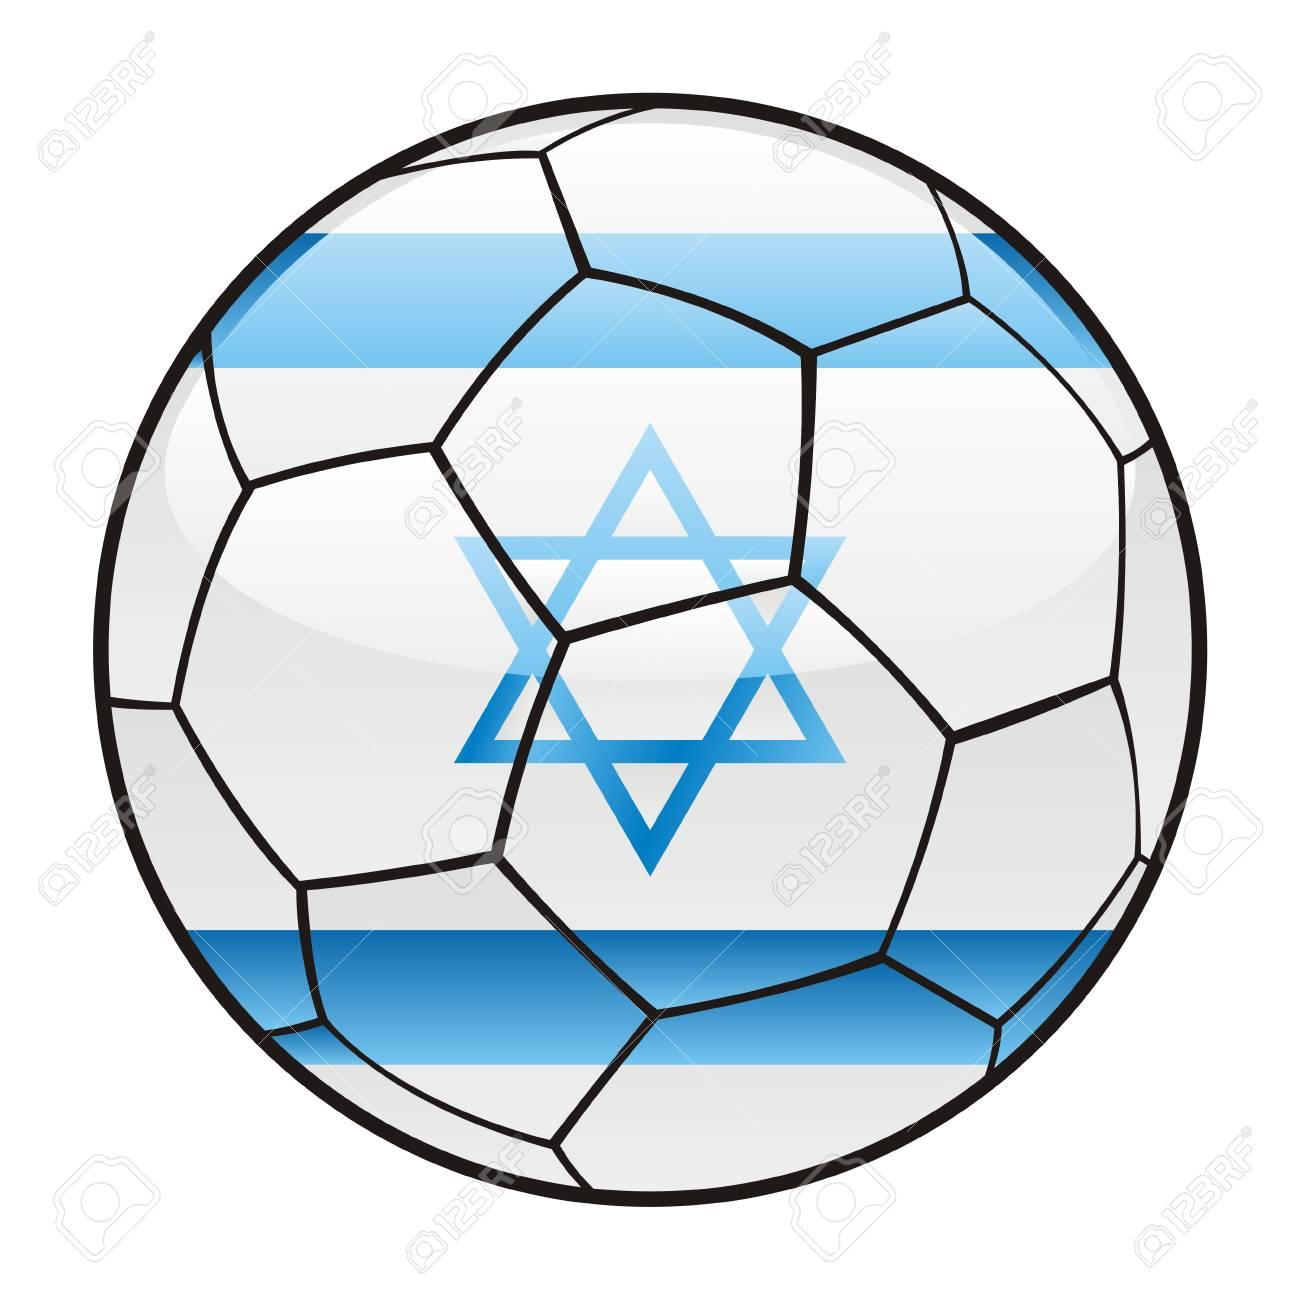 vector illustration of Israel flag on soccer ball Stock Vector - 7370230